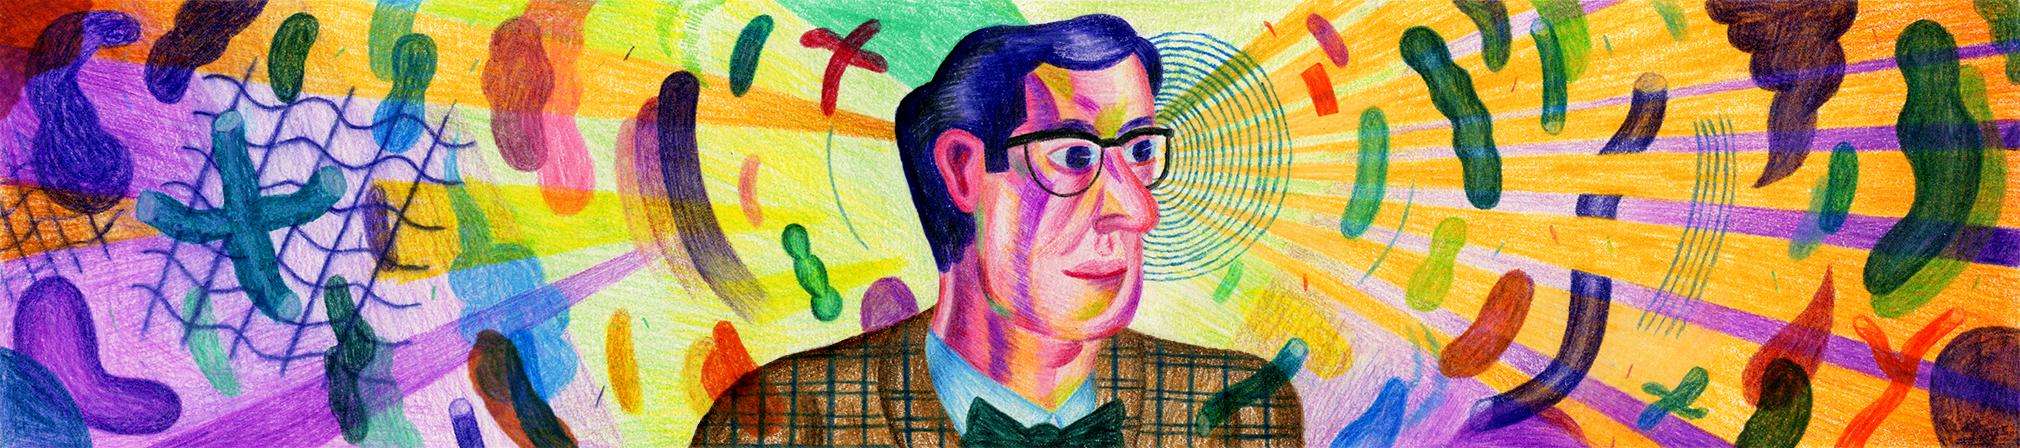 Isaac Asimov Essay